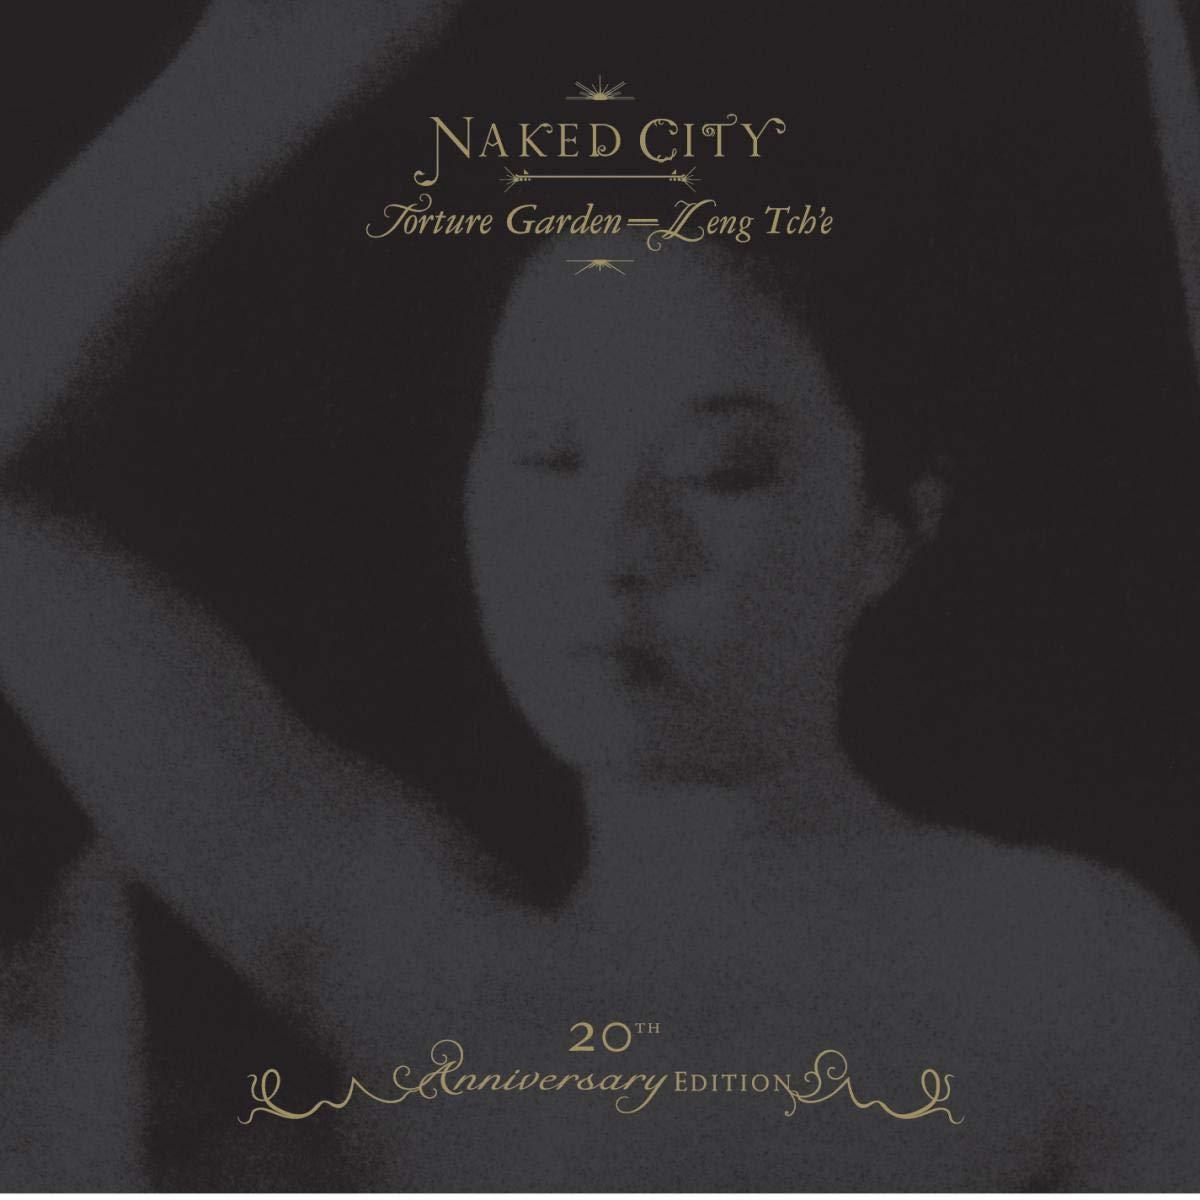 Black Box - 20th Anniversary Edition: Torture Garden / Leng Tch'e